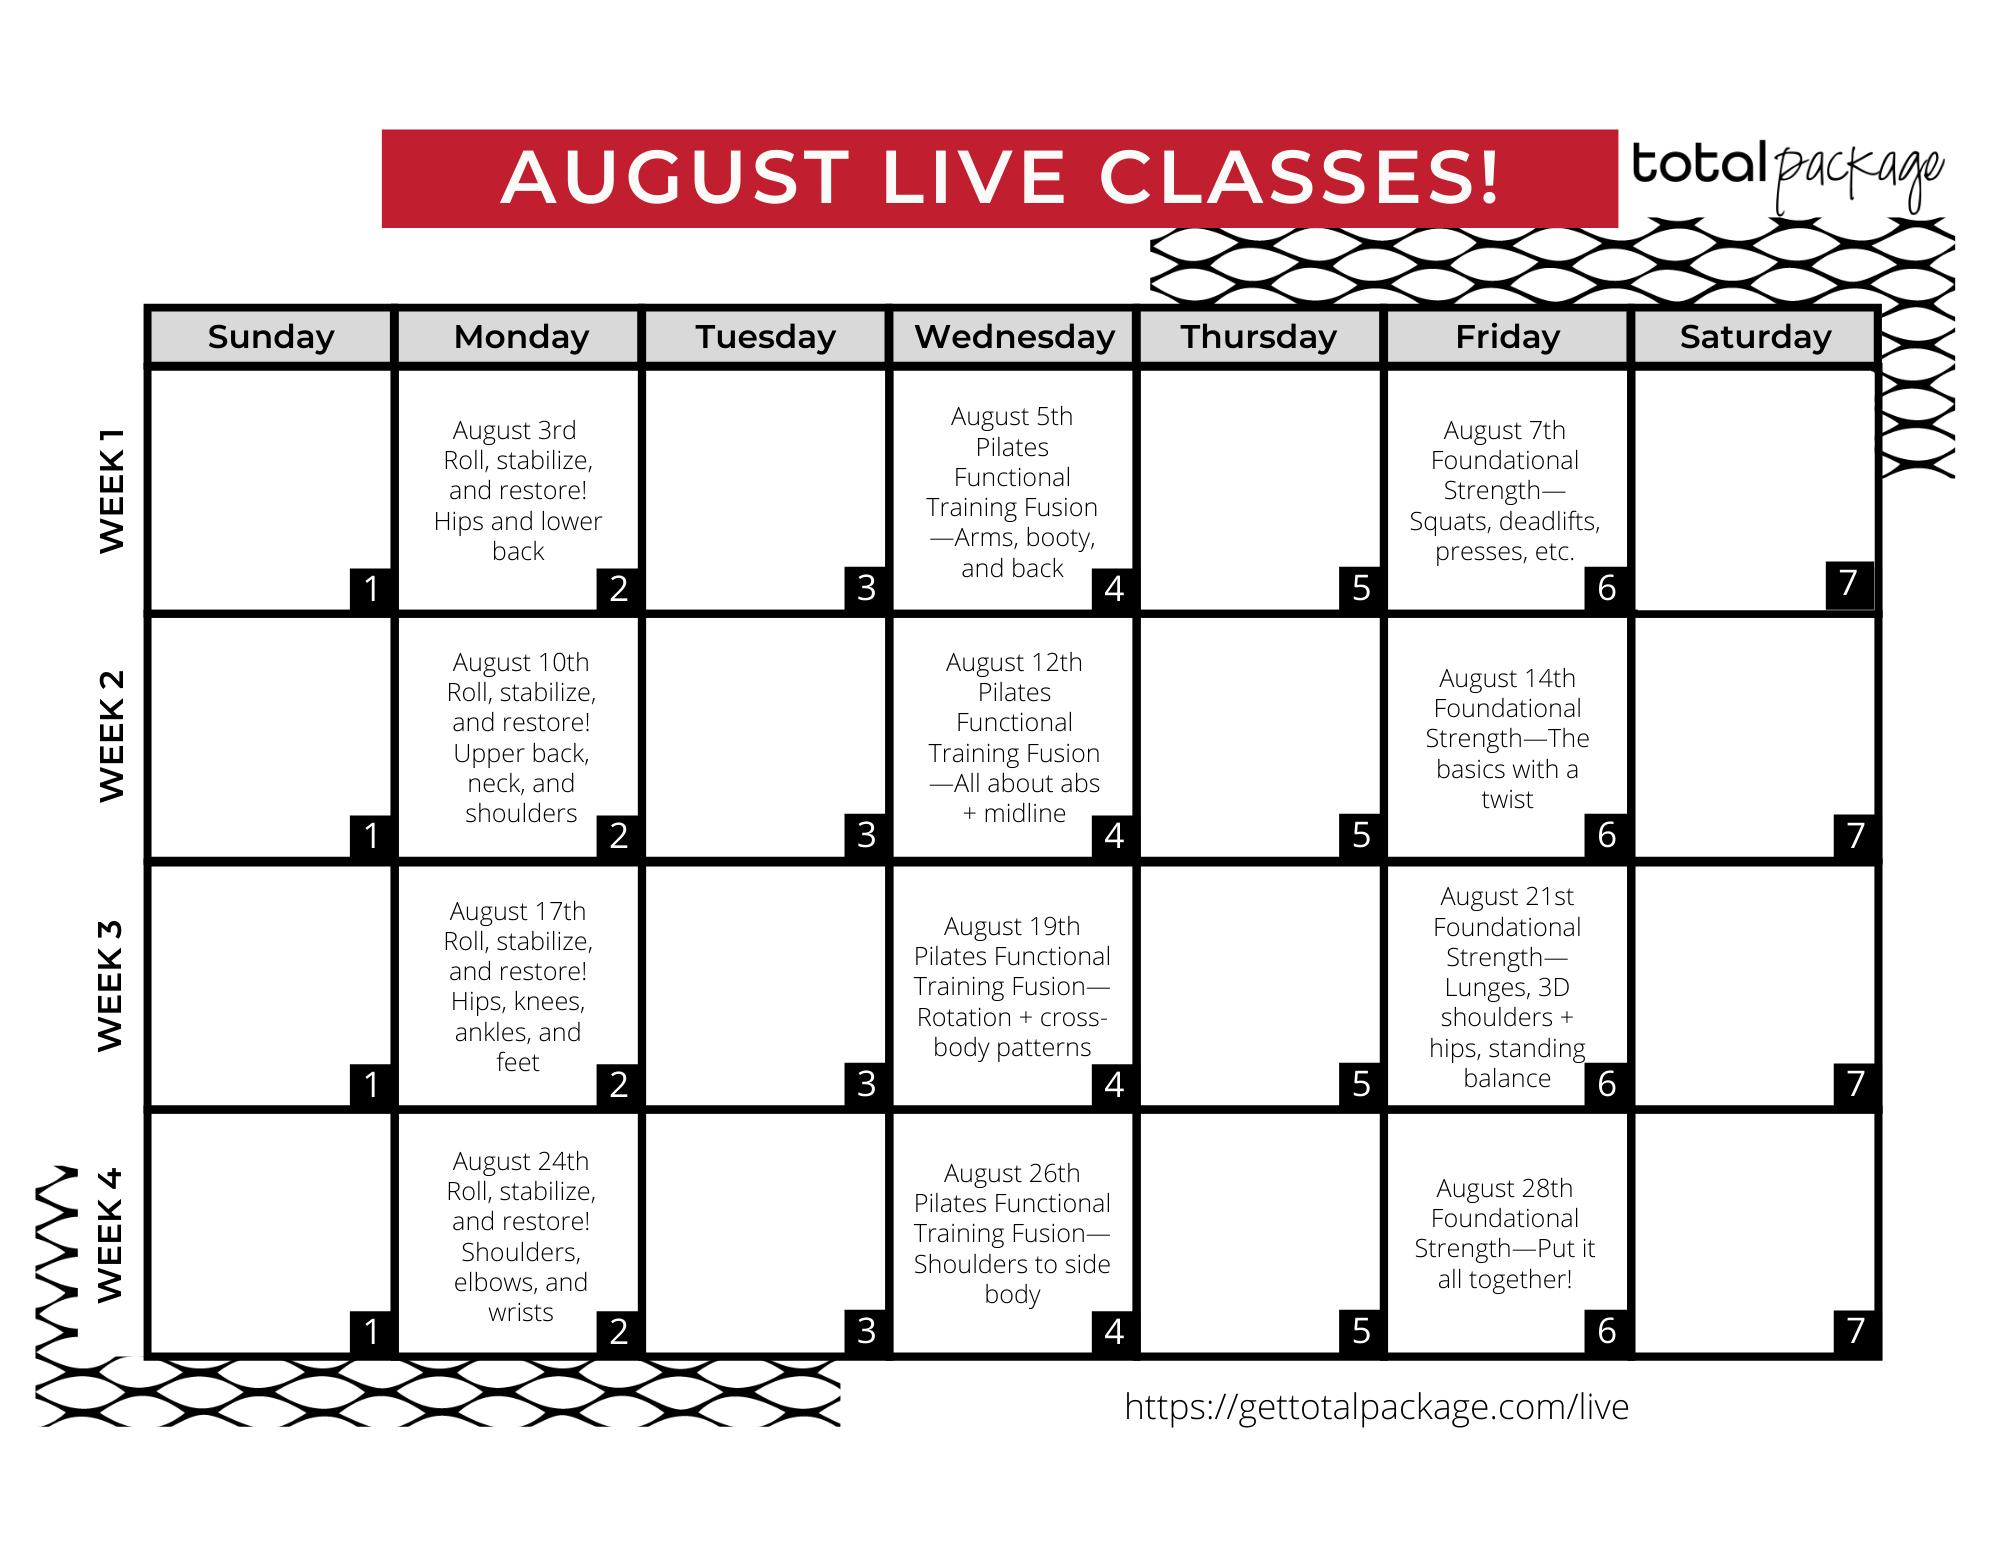 August Live Classes